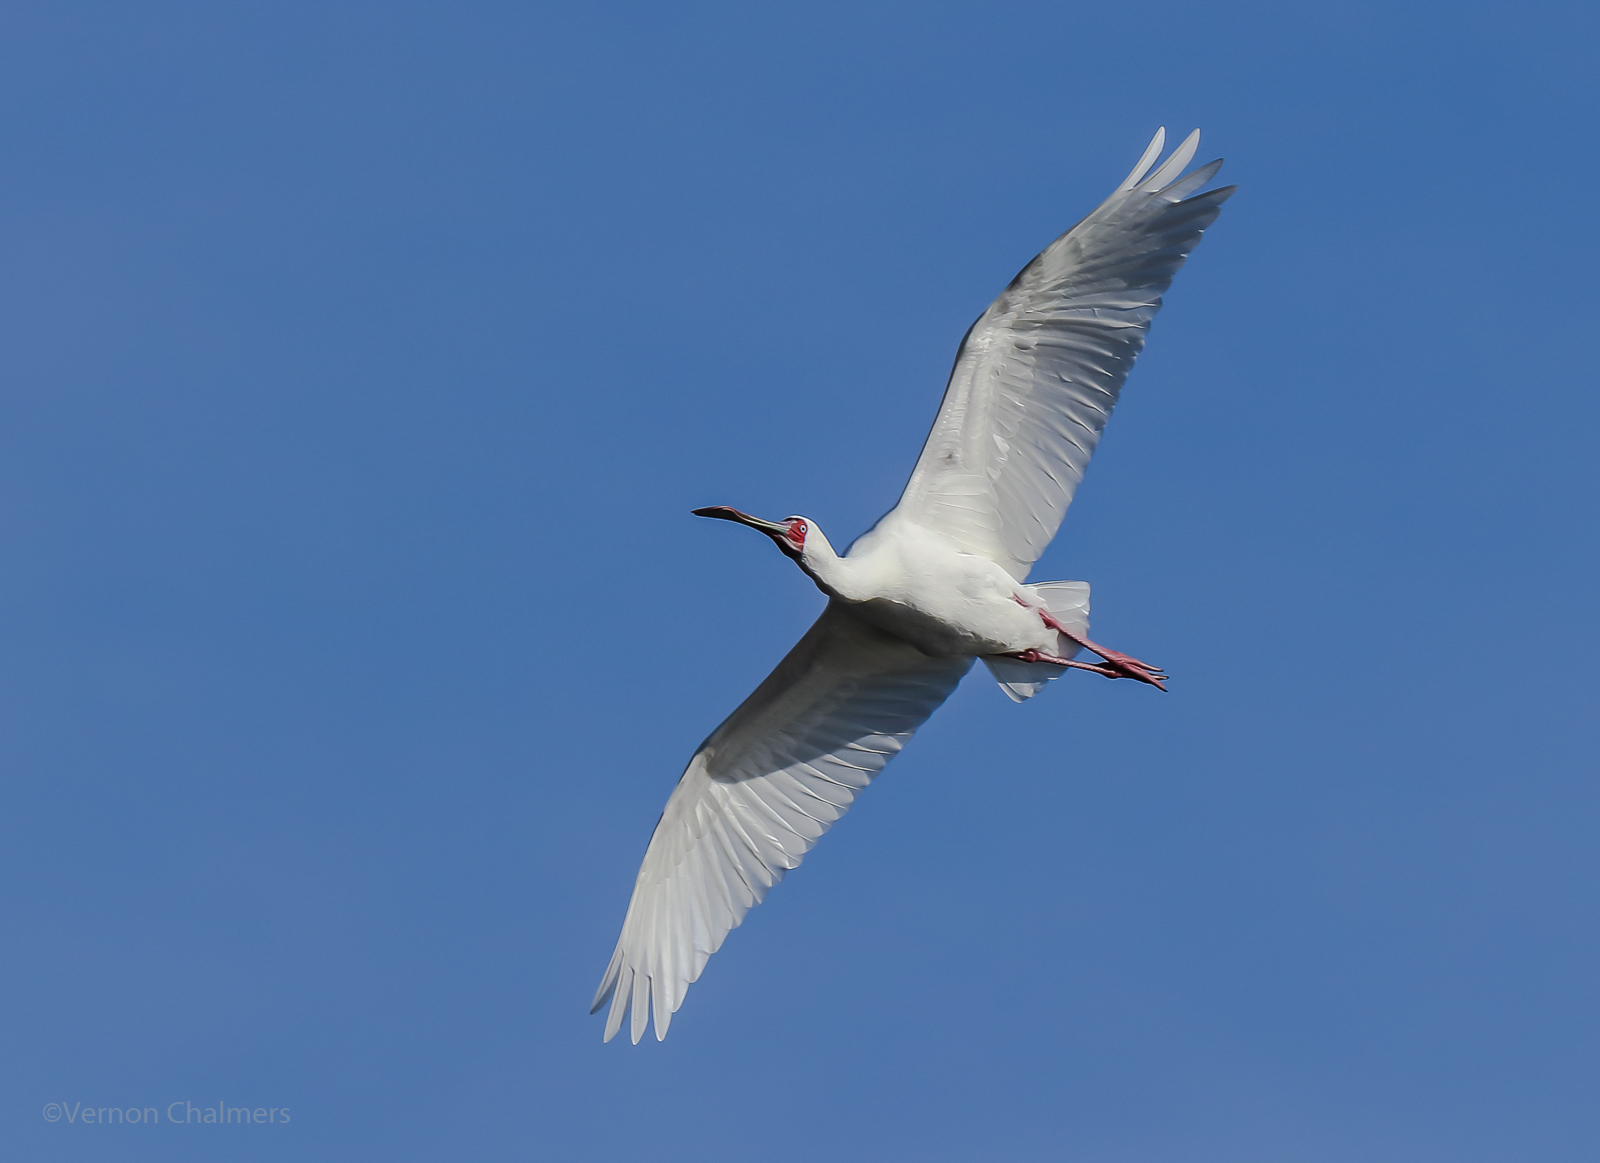 Vernon Chalmers Photography: Canon EOS 80D: Birds in Flight Photography